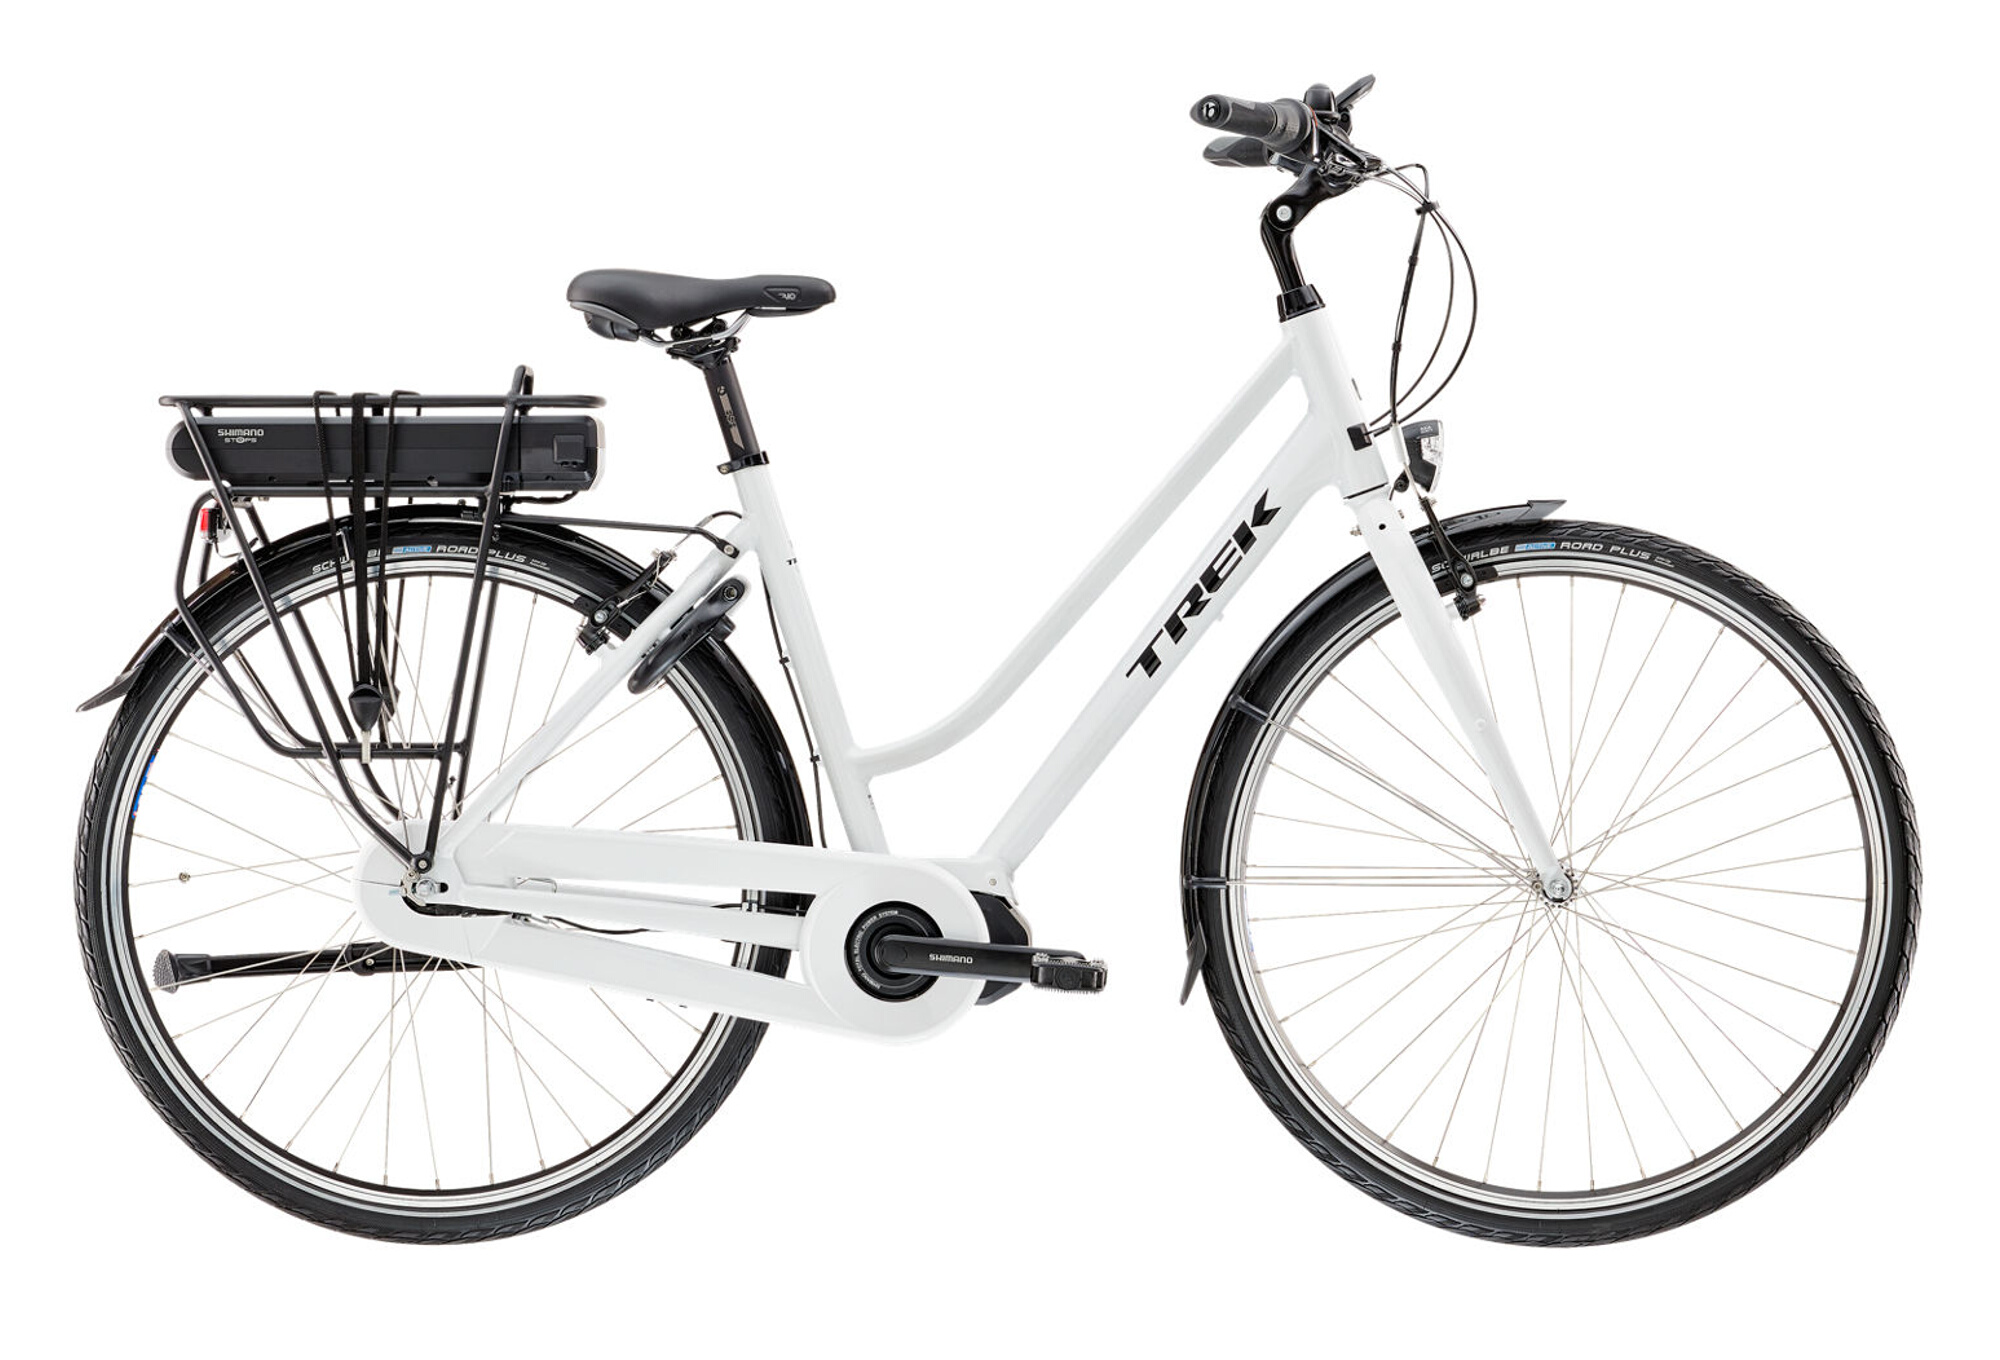 trek lm200 blx midstep women e bike shimano nexus 7s. Black Bedroom Furniture Sets. Home Design Ideas